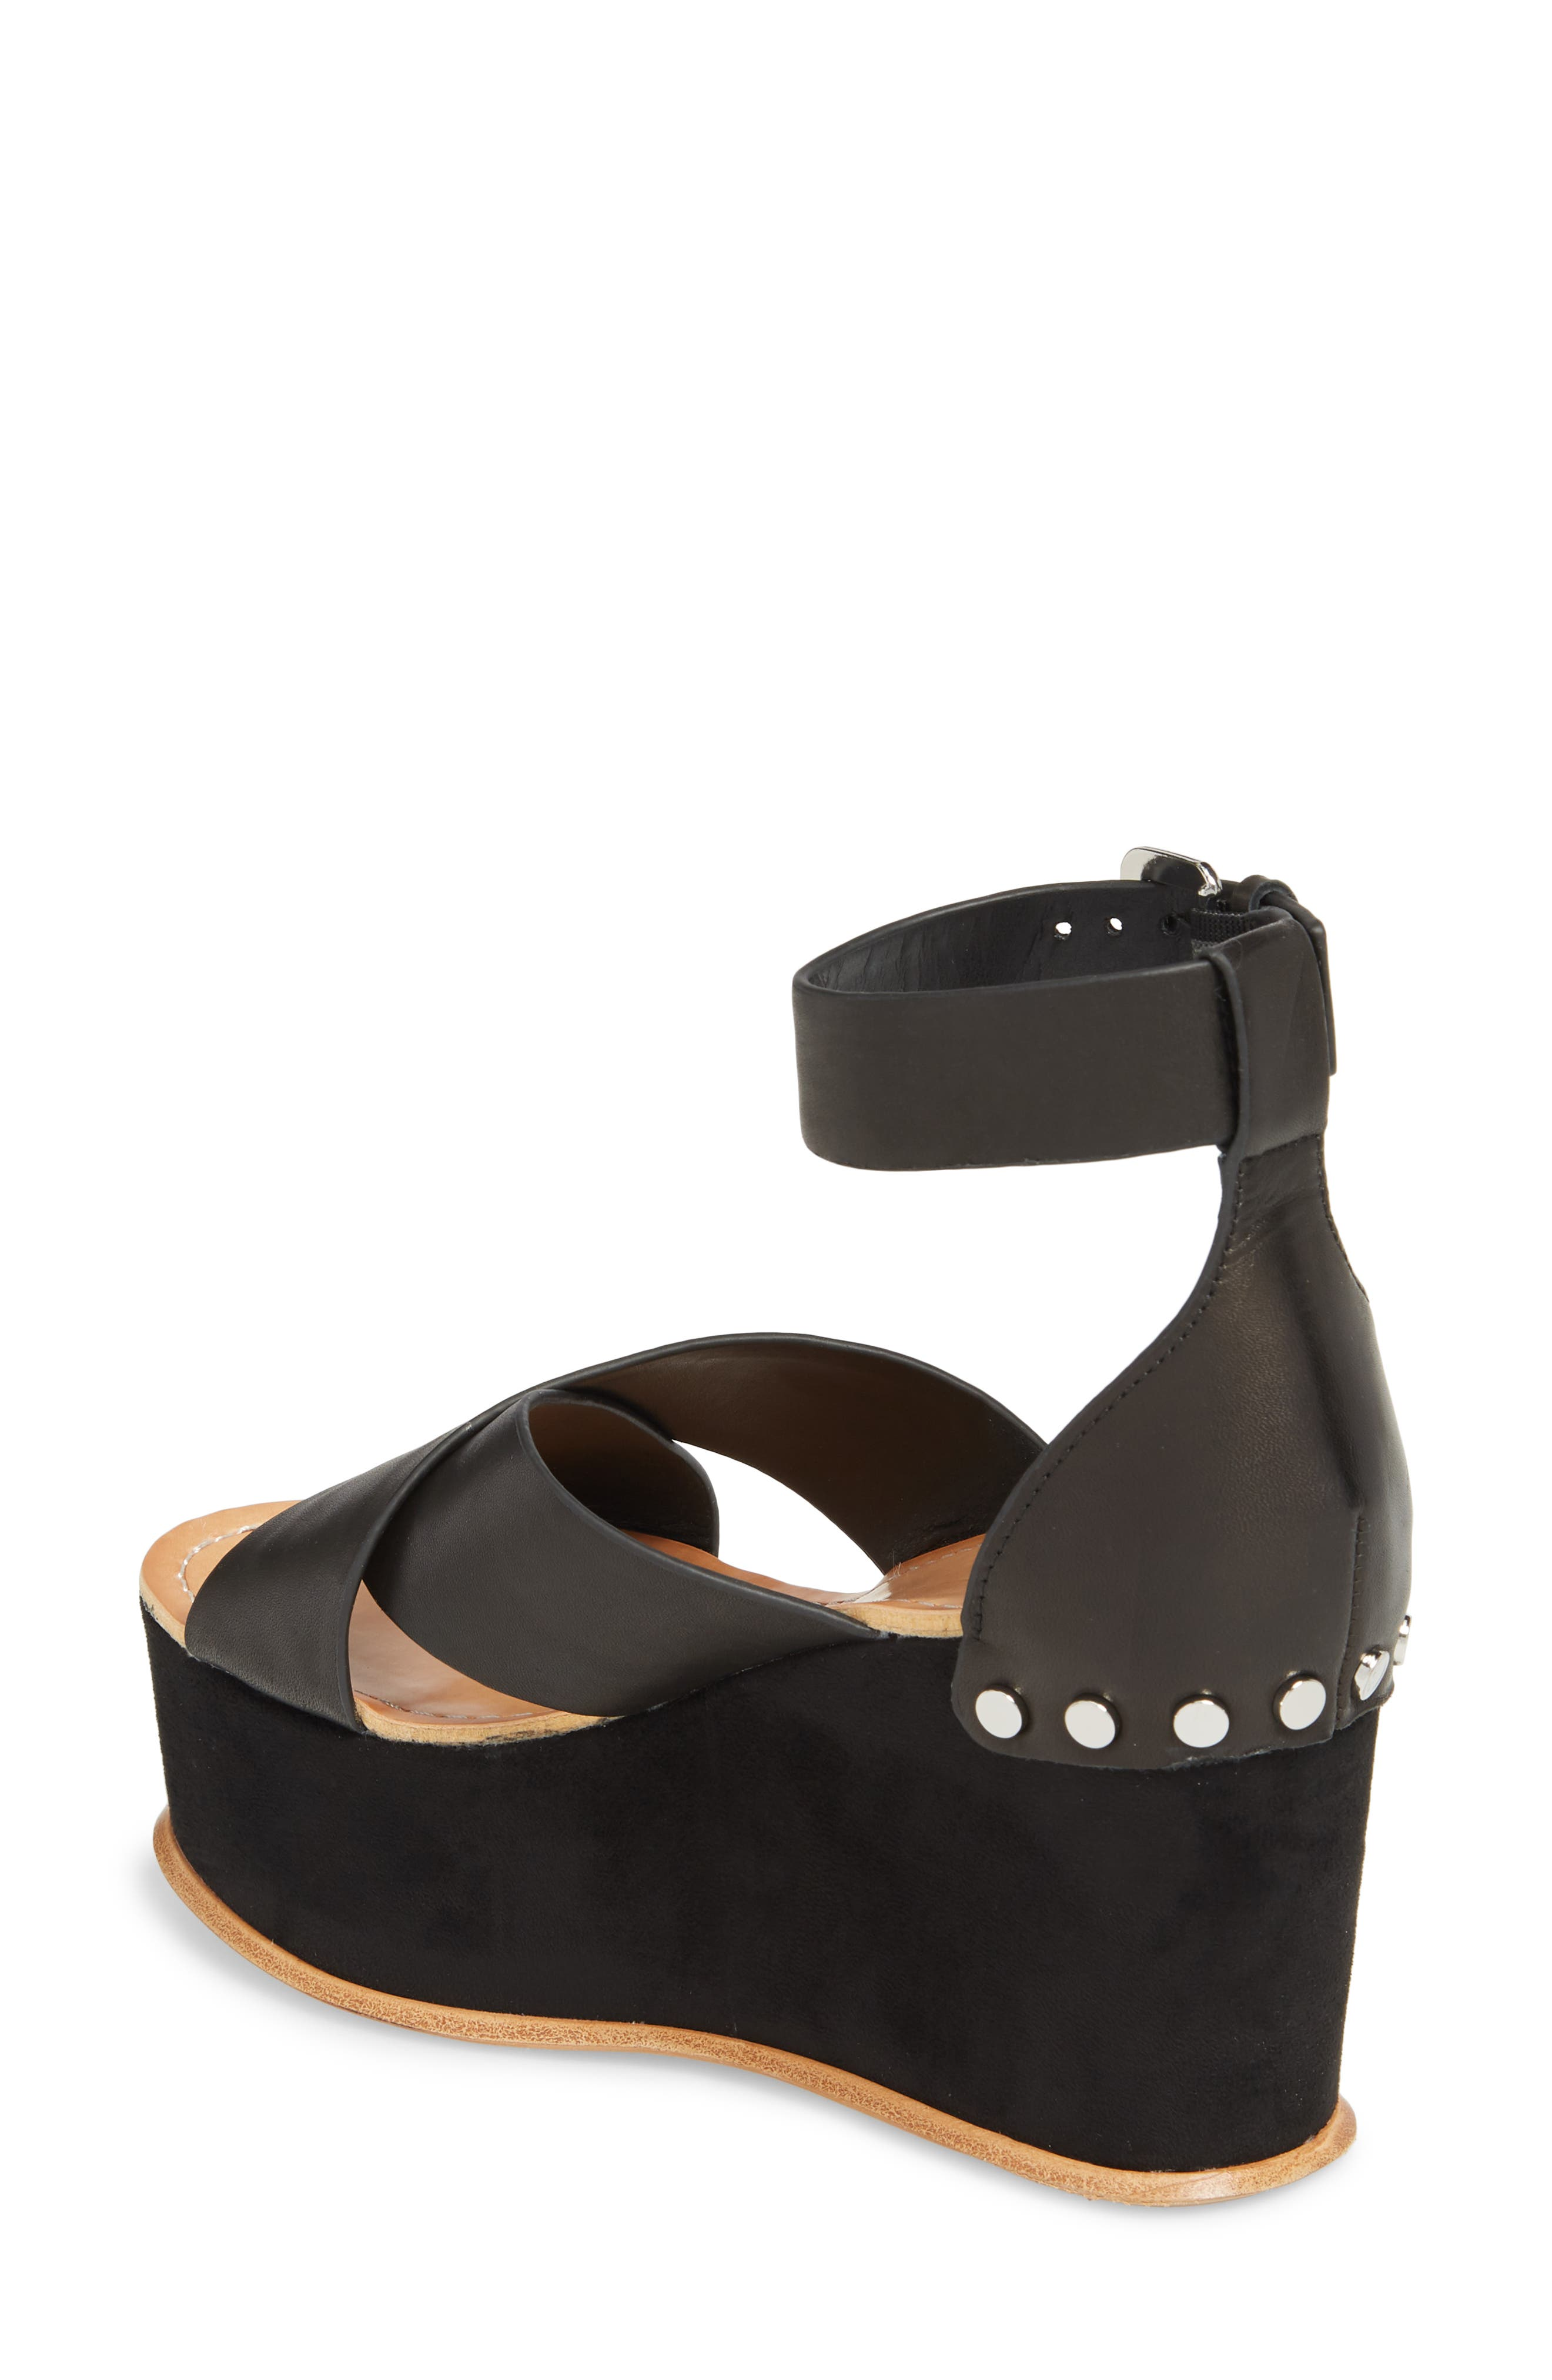 DOLCE VITA,                             Dalrae Platform Wedge Sandal,                             Alternate thumbnail 2, color,                             001